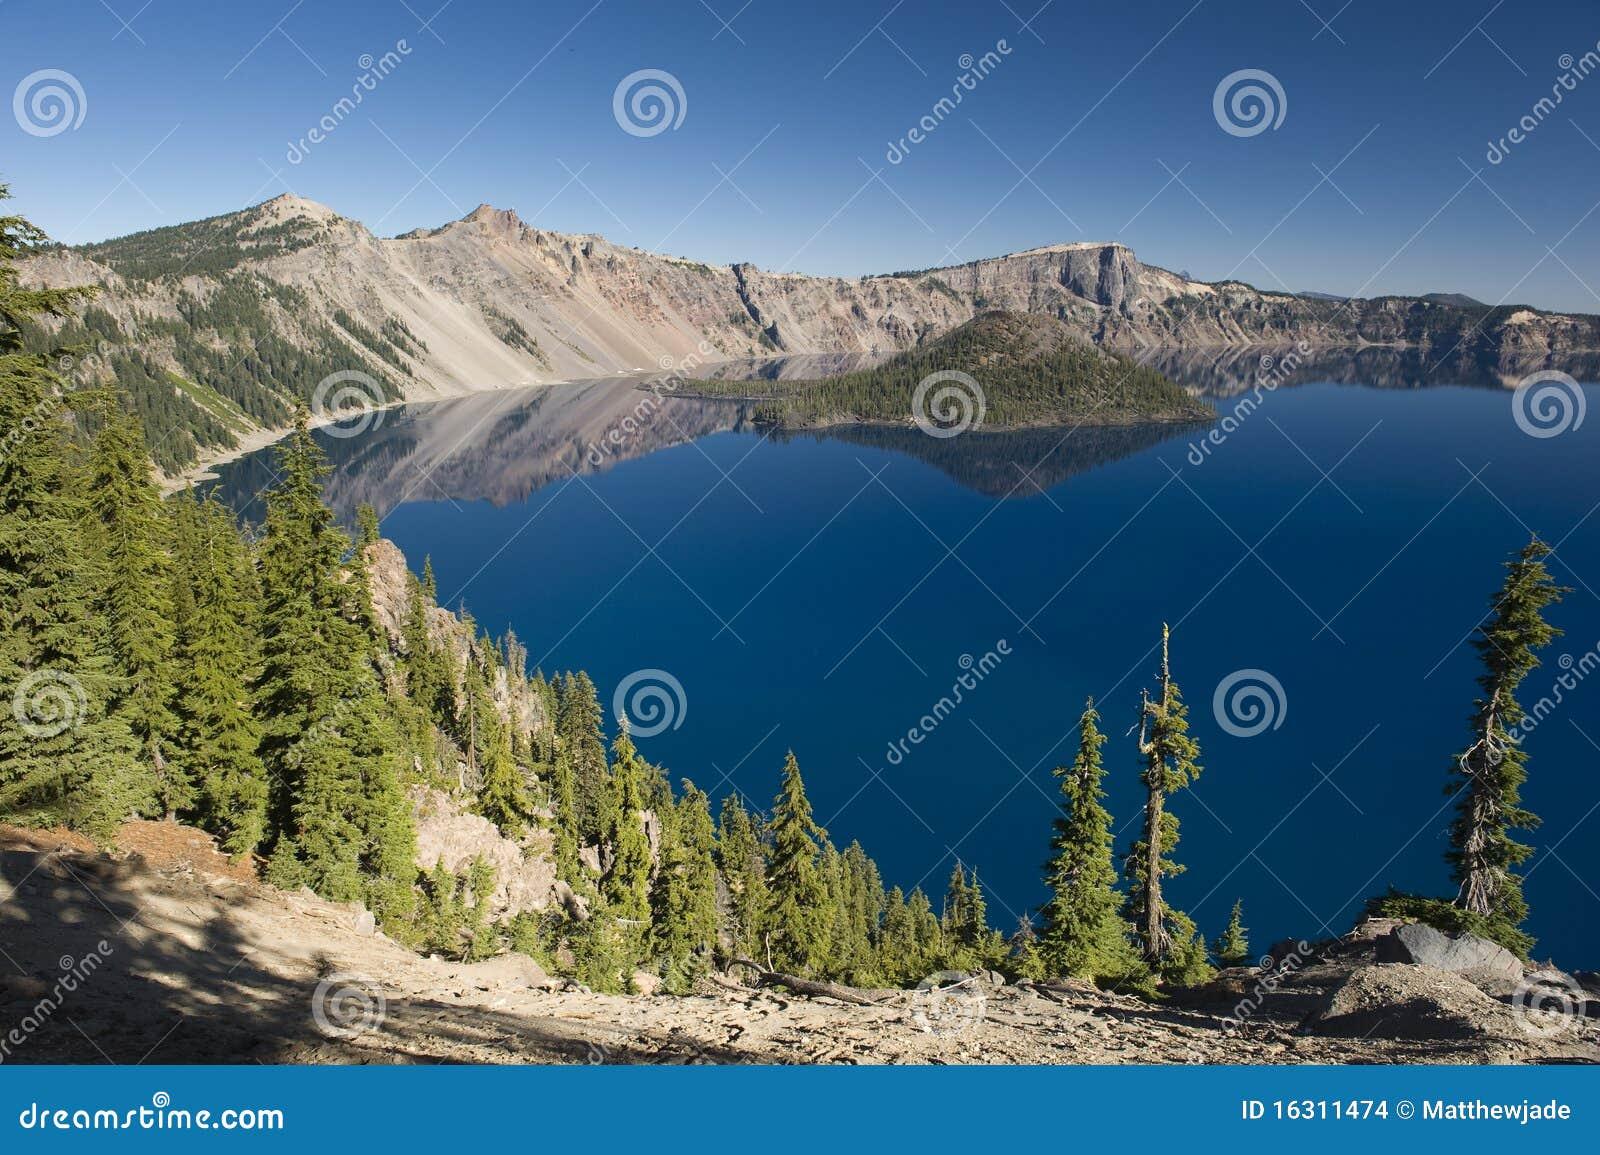 pin crater lake oregon - photo #42